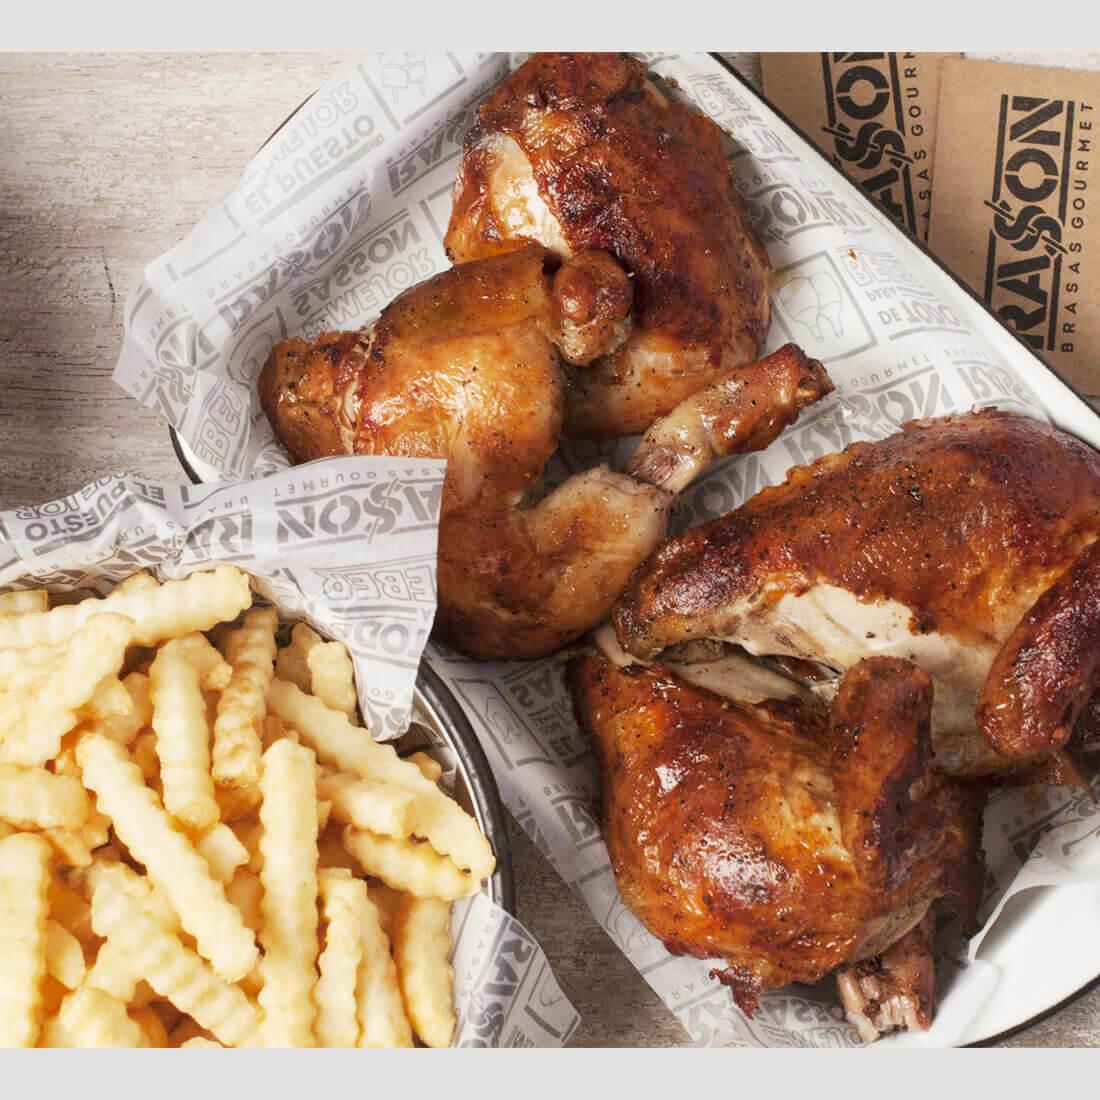 RASSON BRASAS GOURMET - JOCKEY PLAZA Restaurant - and Peruvian Food PERUVIAN - SANTIAGO DE SURCO - MESA 24/7 Guide | LIMA - Peru